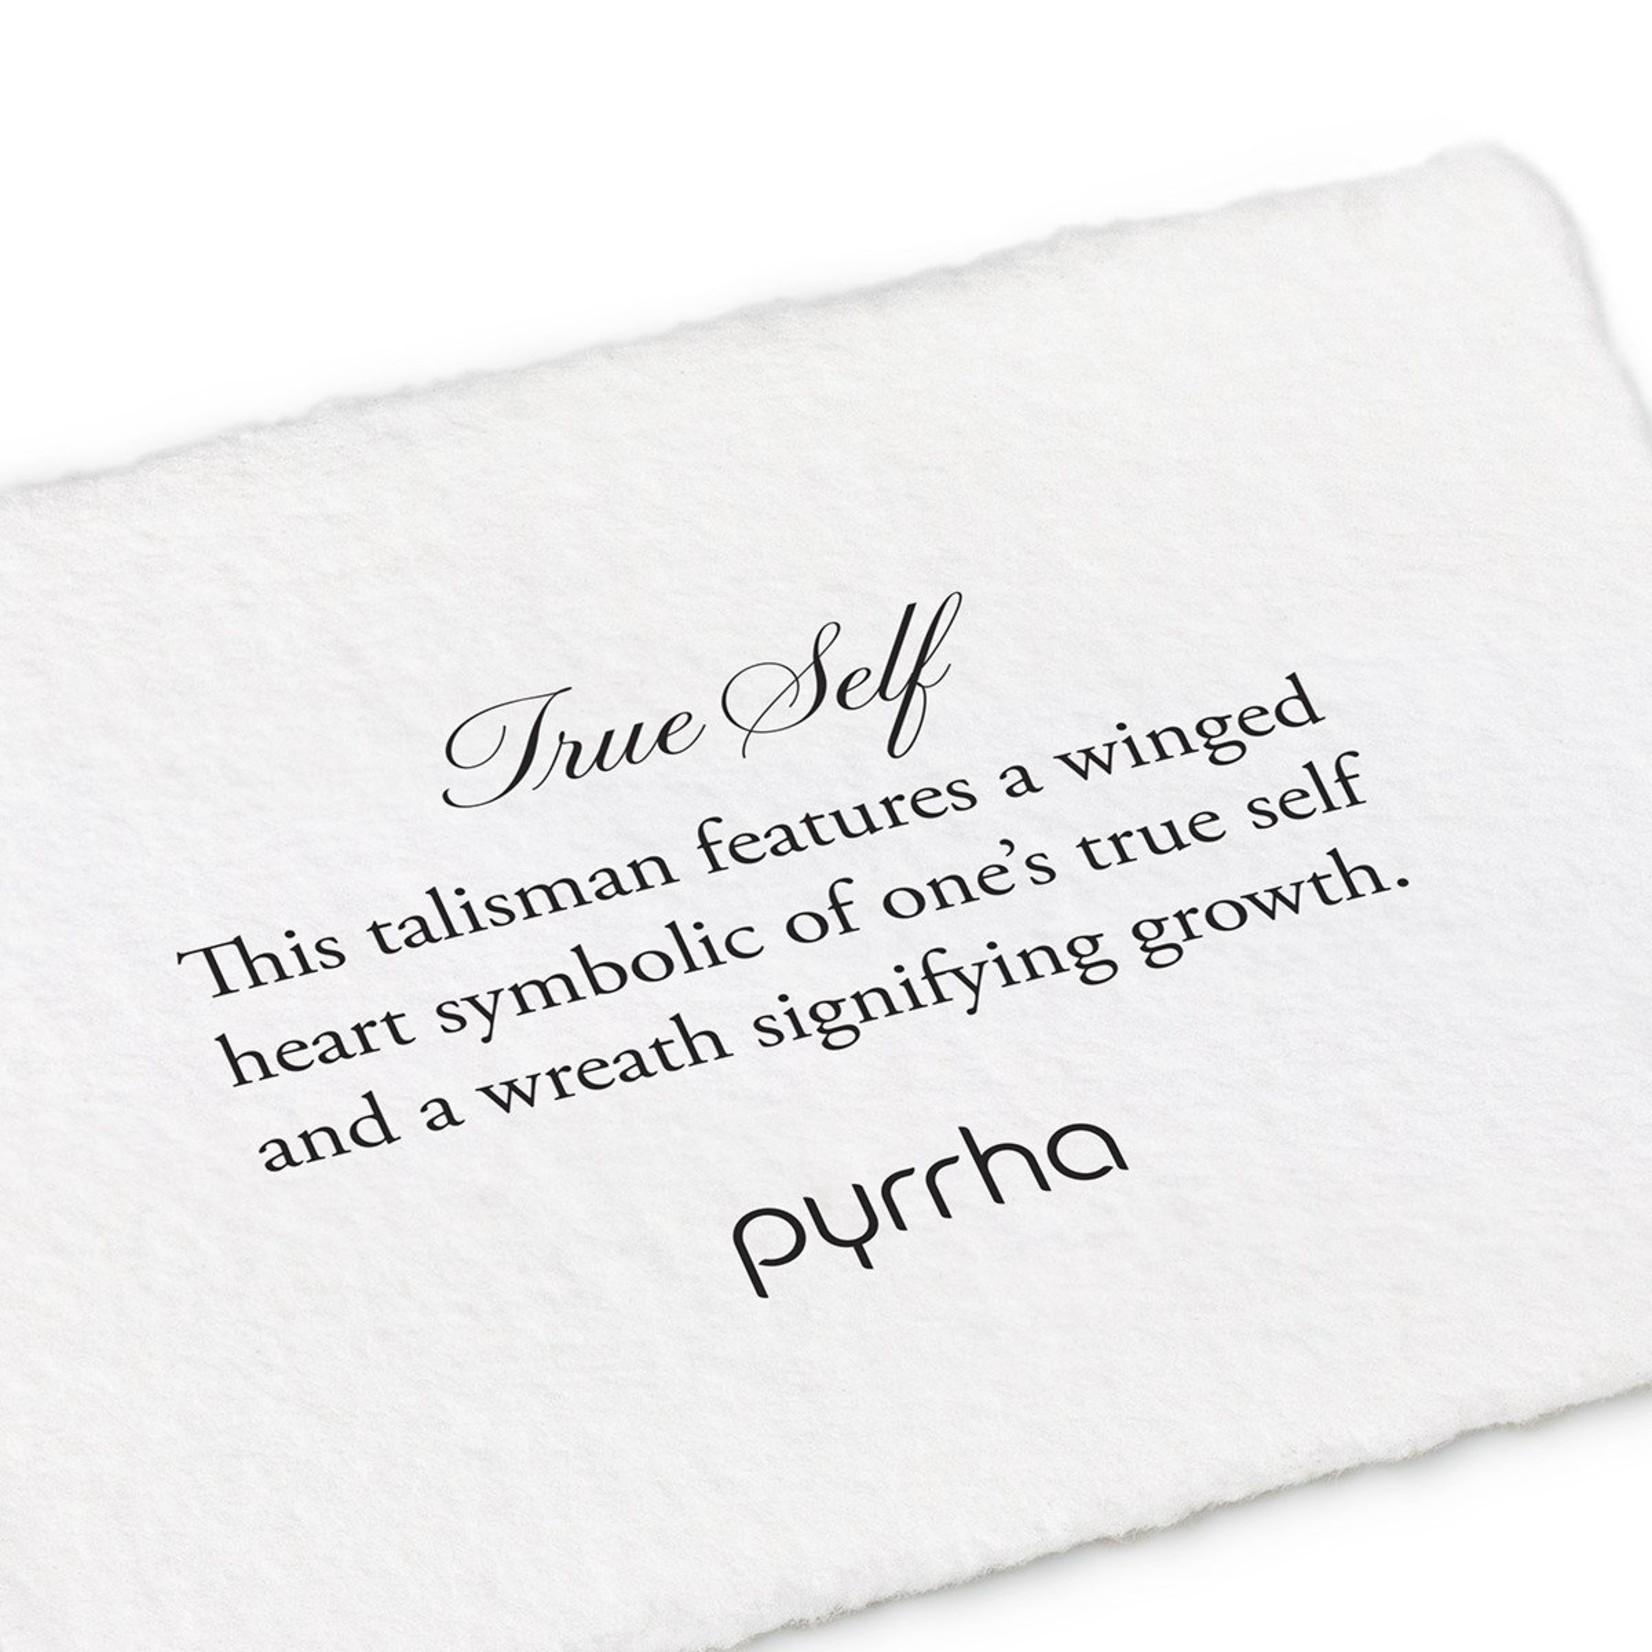 Pyrrha True Self Signature Talisman